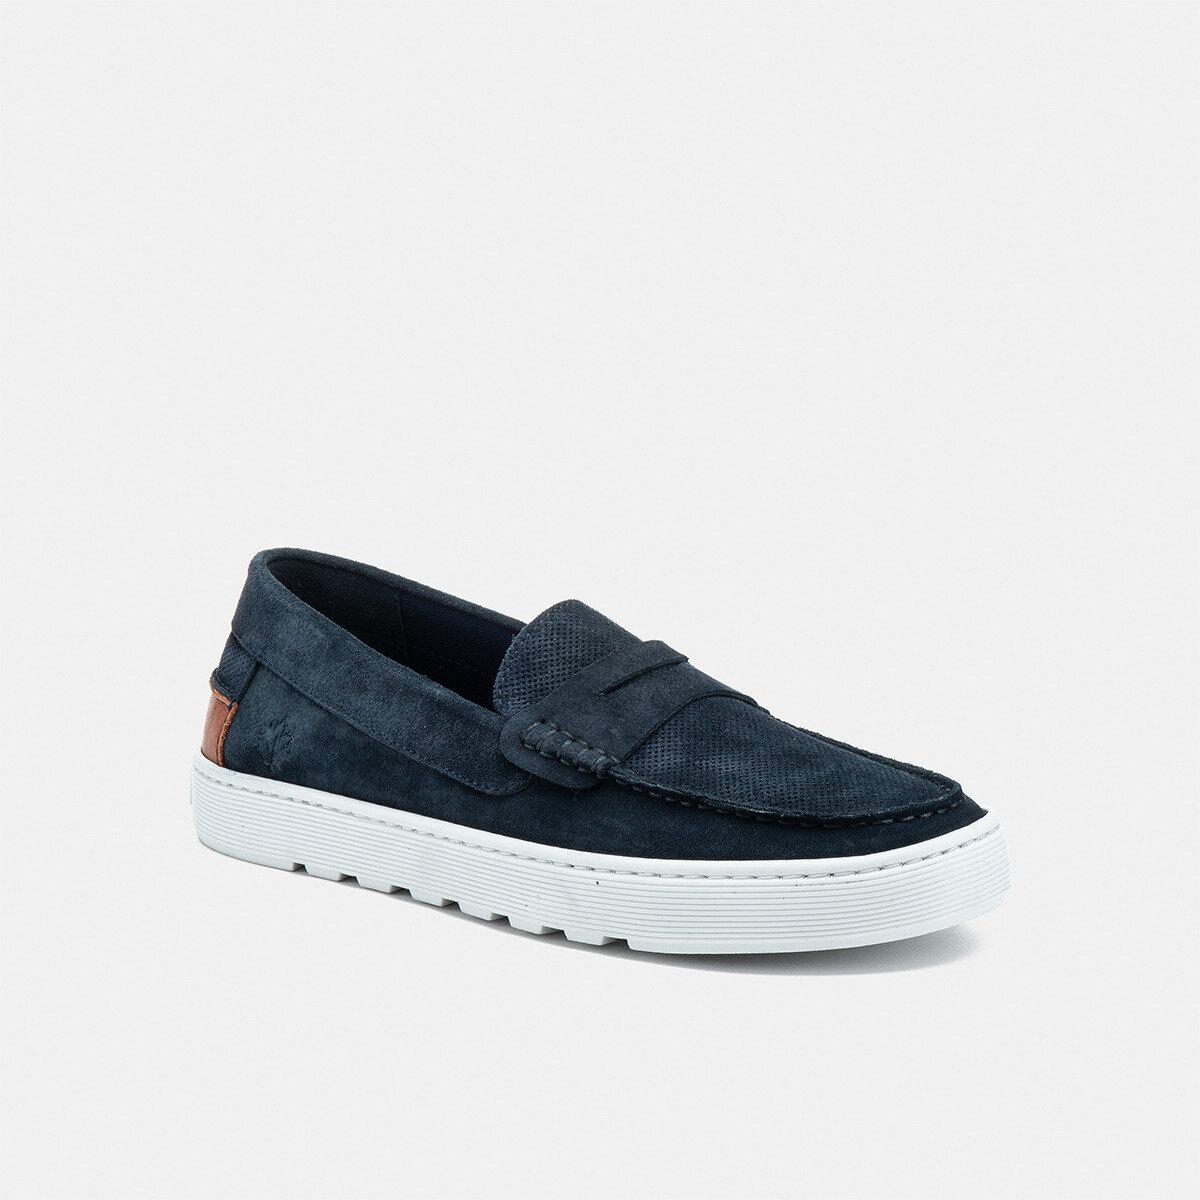 WAYNE UNIVERSE BLUE Man Loafers